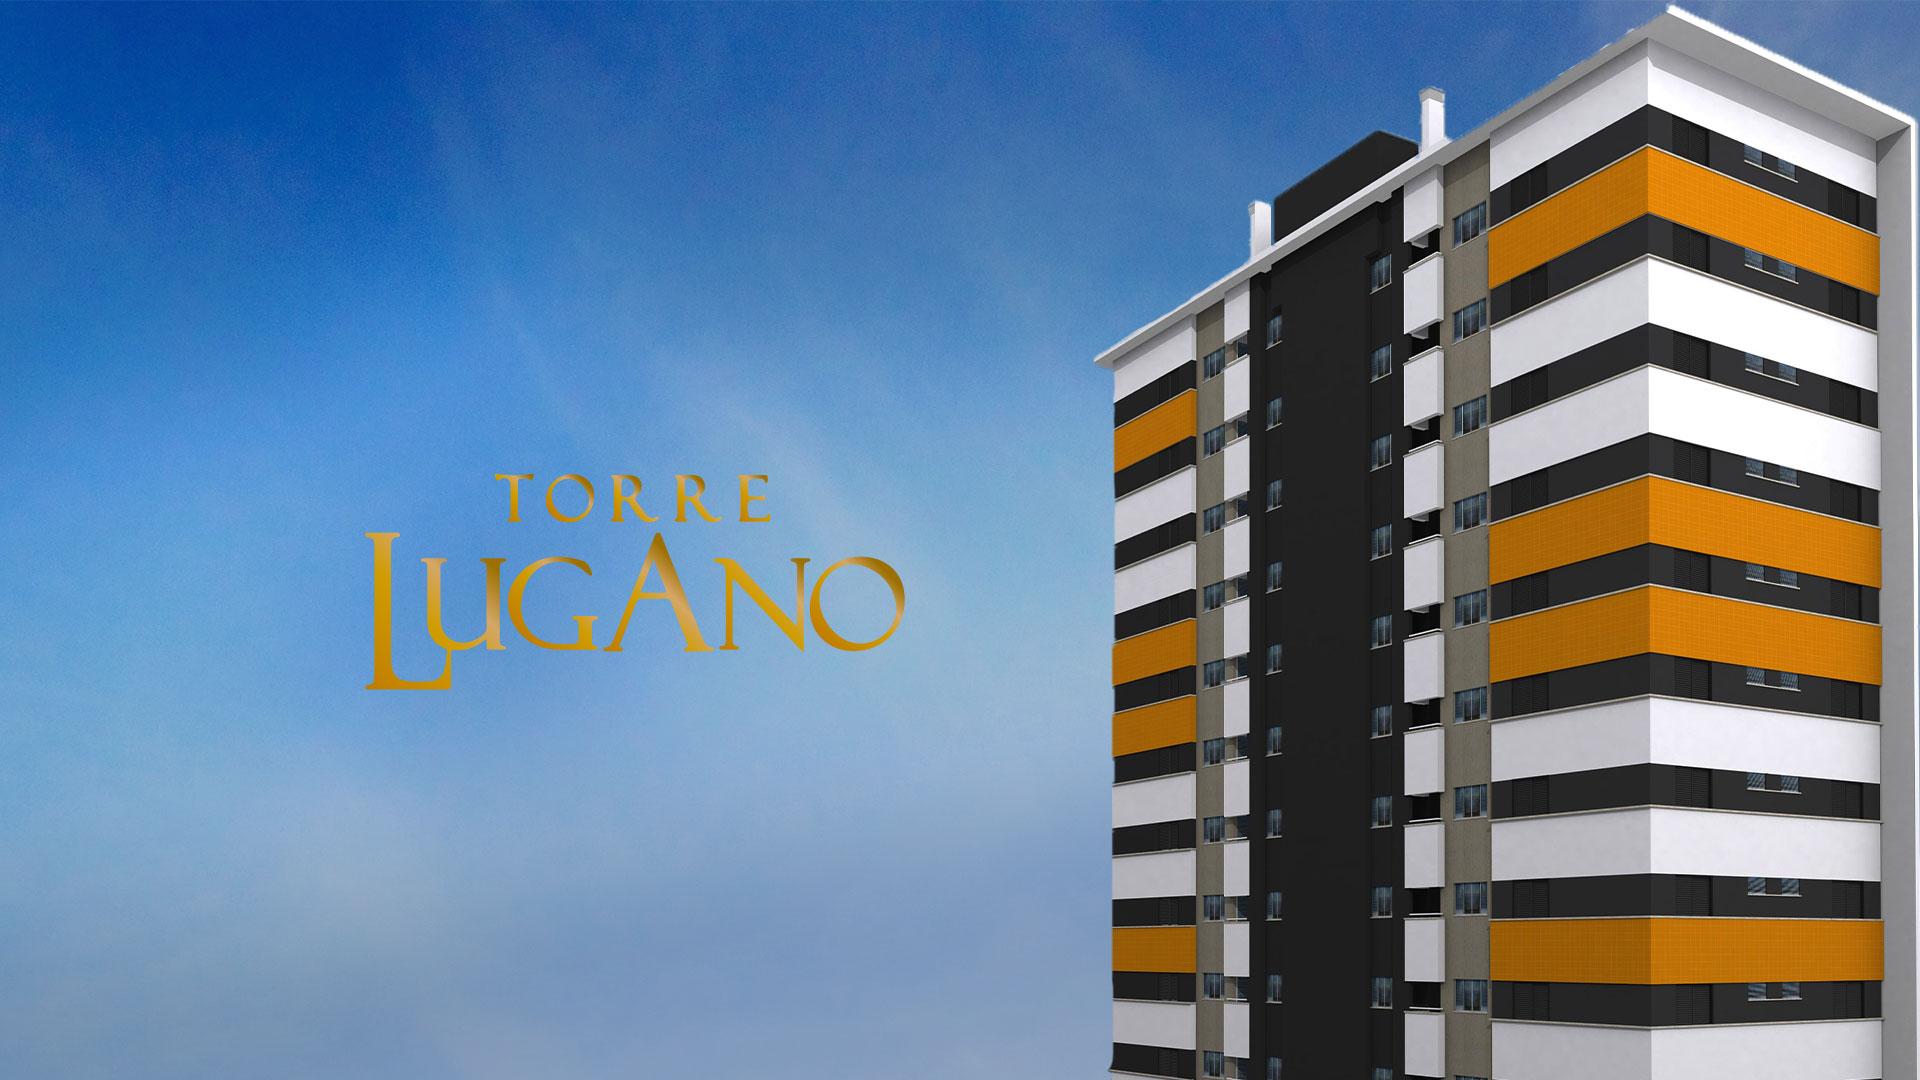 Torre Lugano